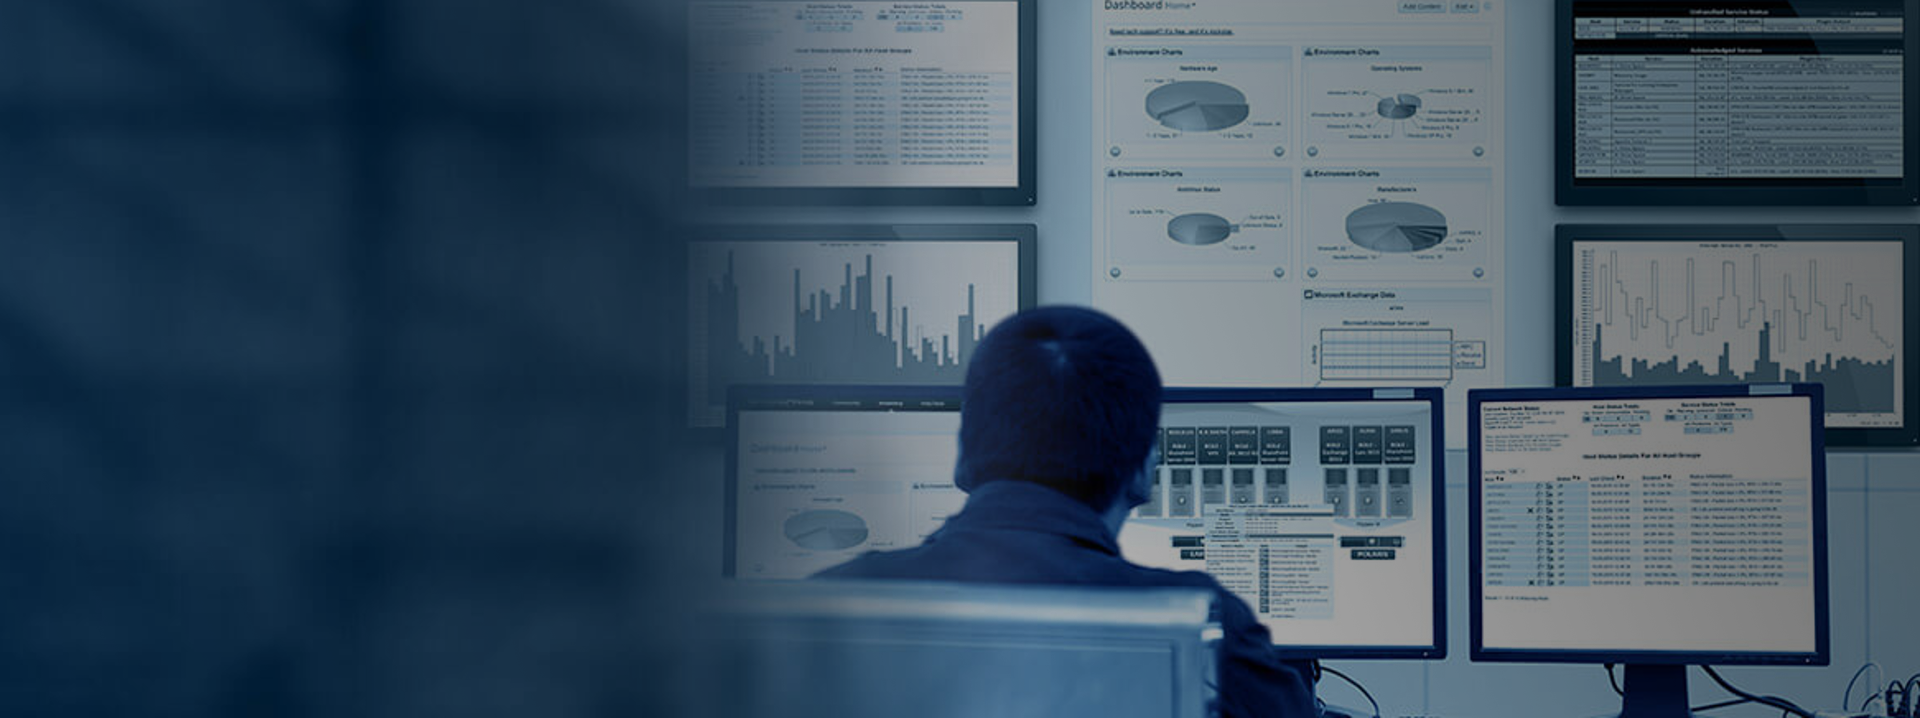 AppPerfect Agentless Monitor 15.0.0 破解版 – 数据库服务器监控软件-麦氪派